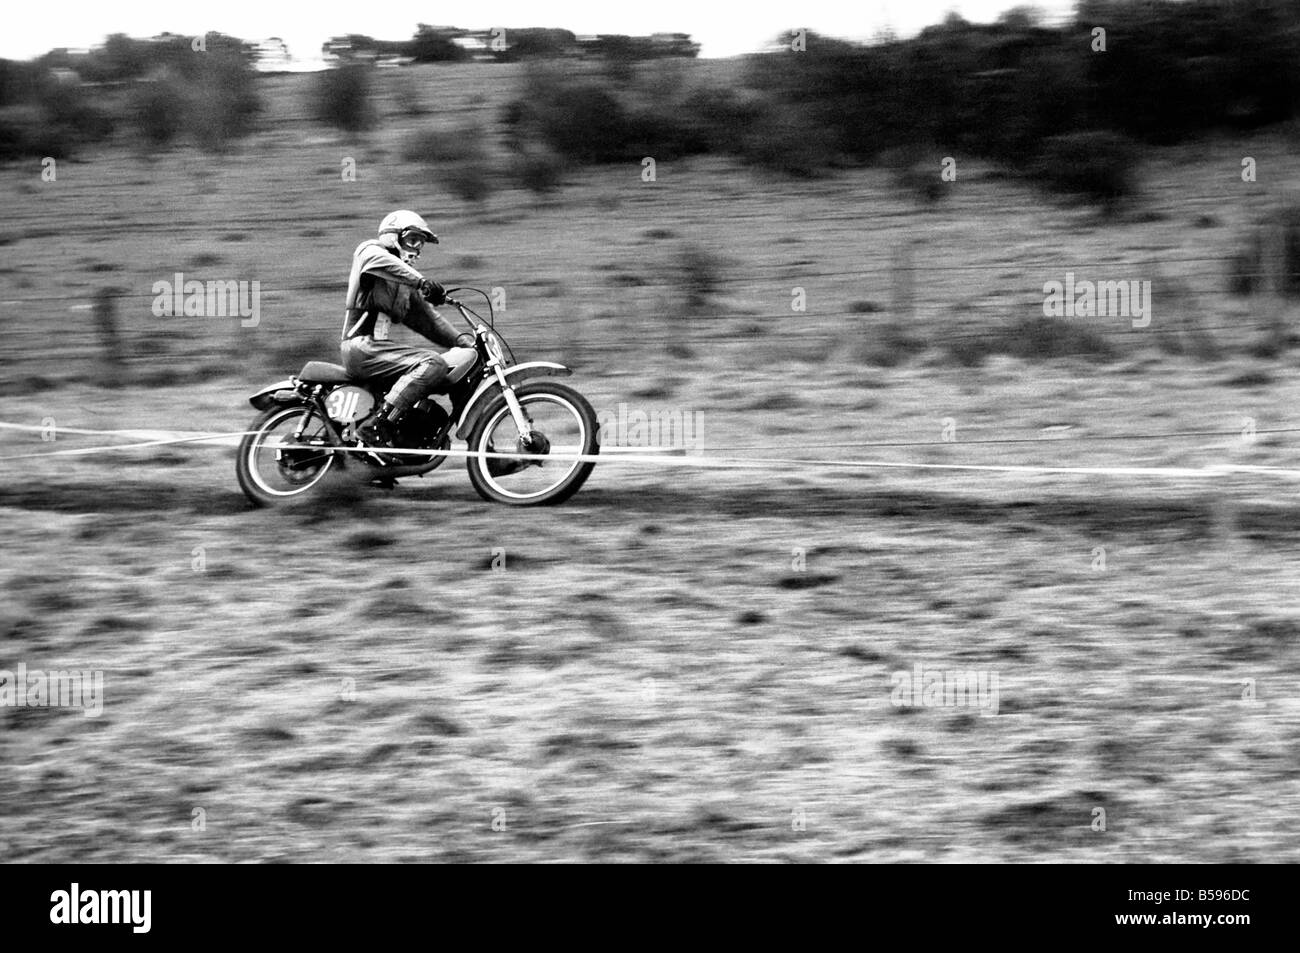 Motorsport/Children/Motorbike: Schoolboys Scramble. March 1975 75-01212-011 - Stock Image